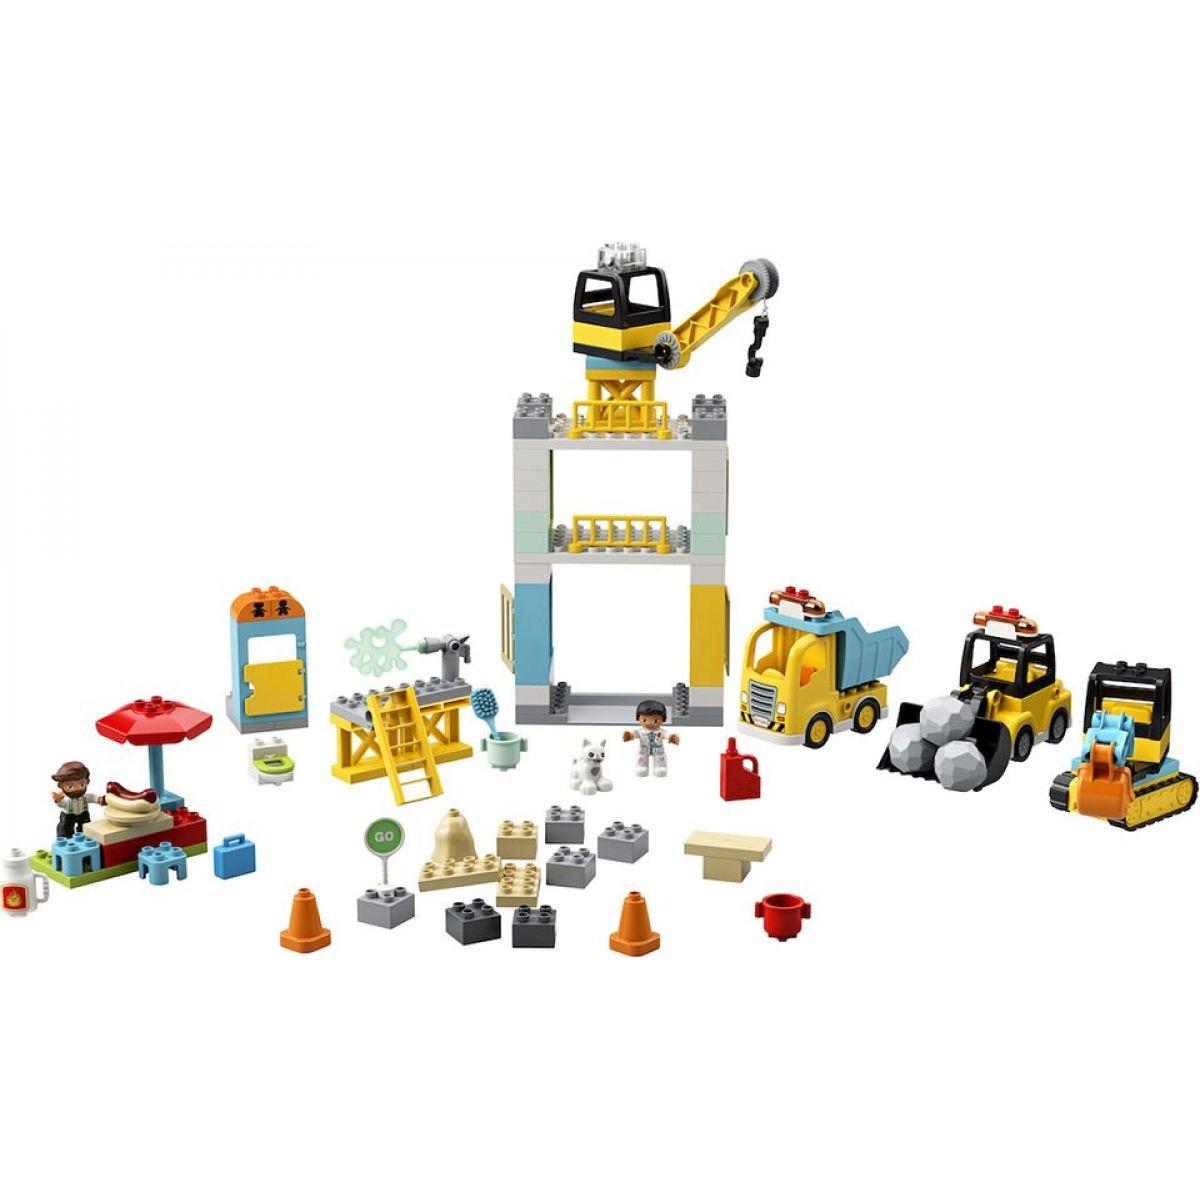 LEGO DUPLO Town 10933 Stavba s věžovým jeřábem